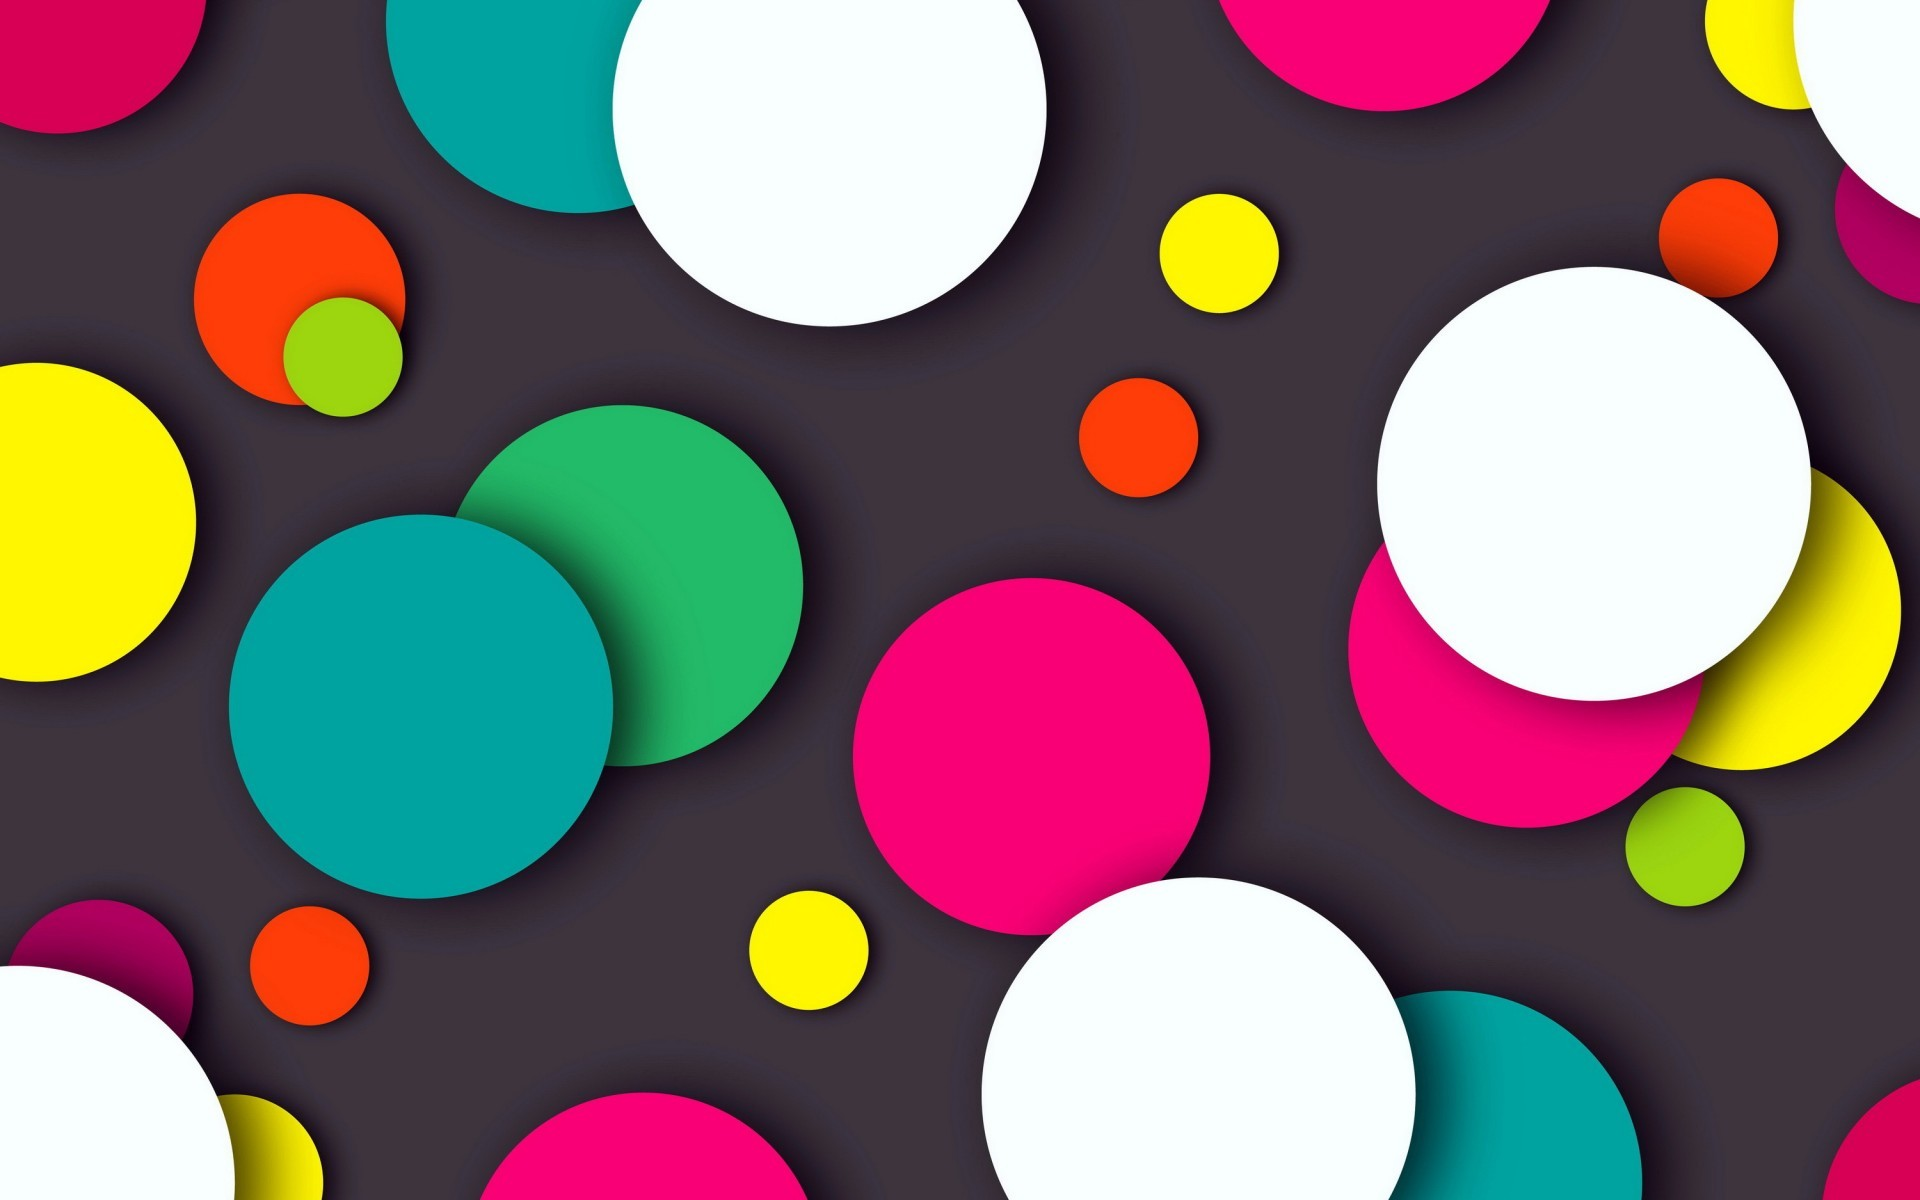 Abstract / Colorful Dots Wallpaper